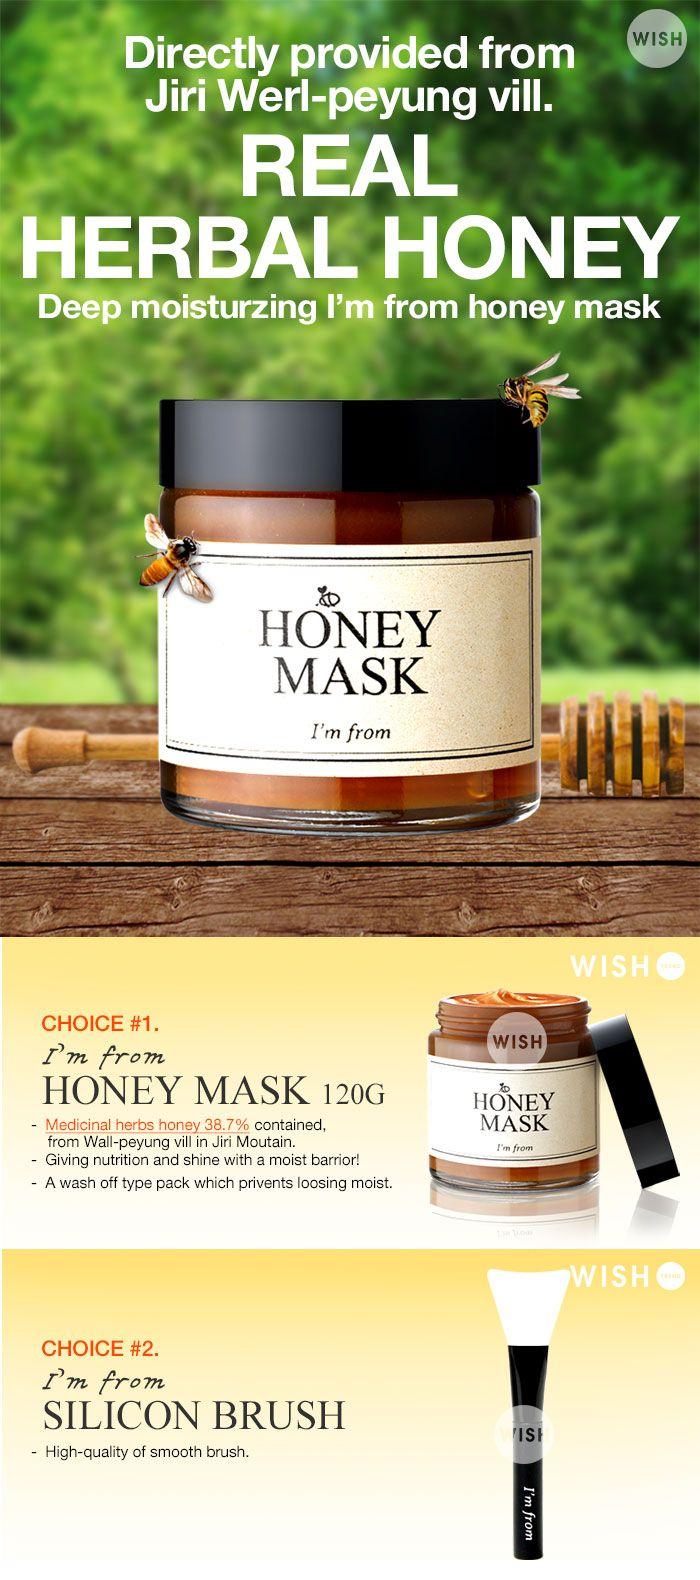 [I'M FROM] Honey Mask (Real Honey 38.7% Inside !)  Real Herval Honey inside ! (38.7%) Directly provided from Jiri Werl-peyung vill. Korea.  Deep moisturizing I'M FROM Honey Mask.  Brand : I'M FROM Volume :  All Skin Types Made in Korea $37.90